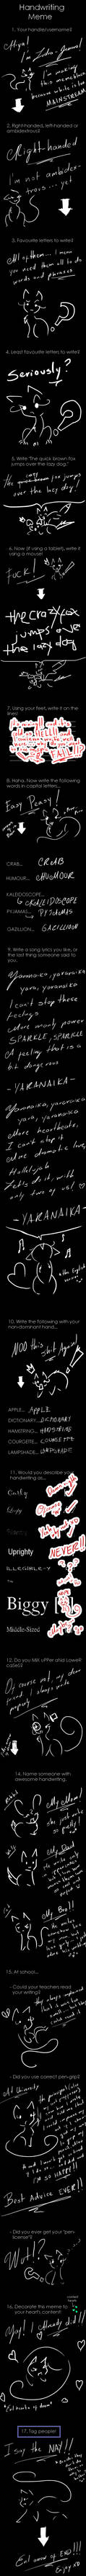 EVIL Handwriting Meme of DOOM!!